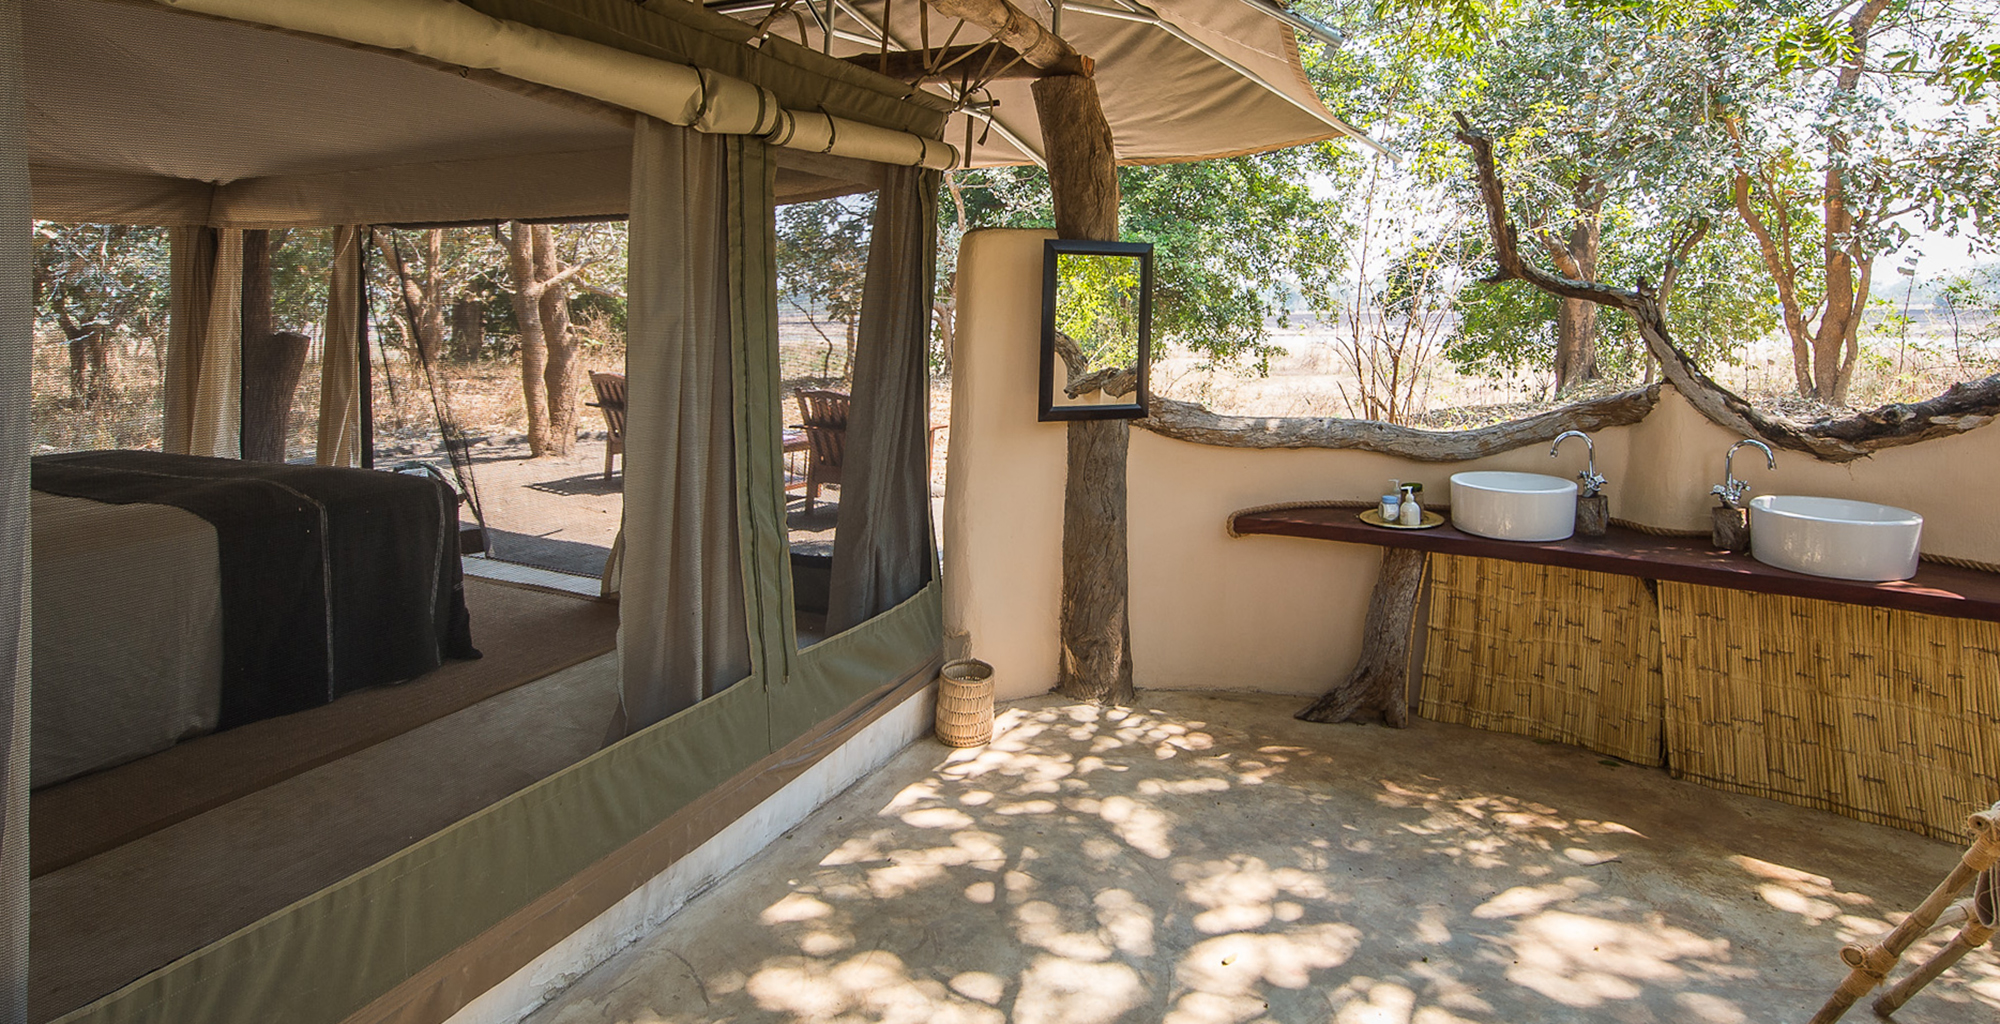 Zambia-Tena-Tena-Bathroom